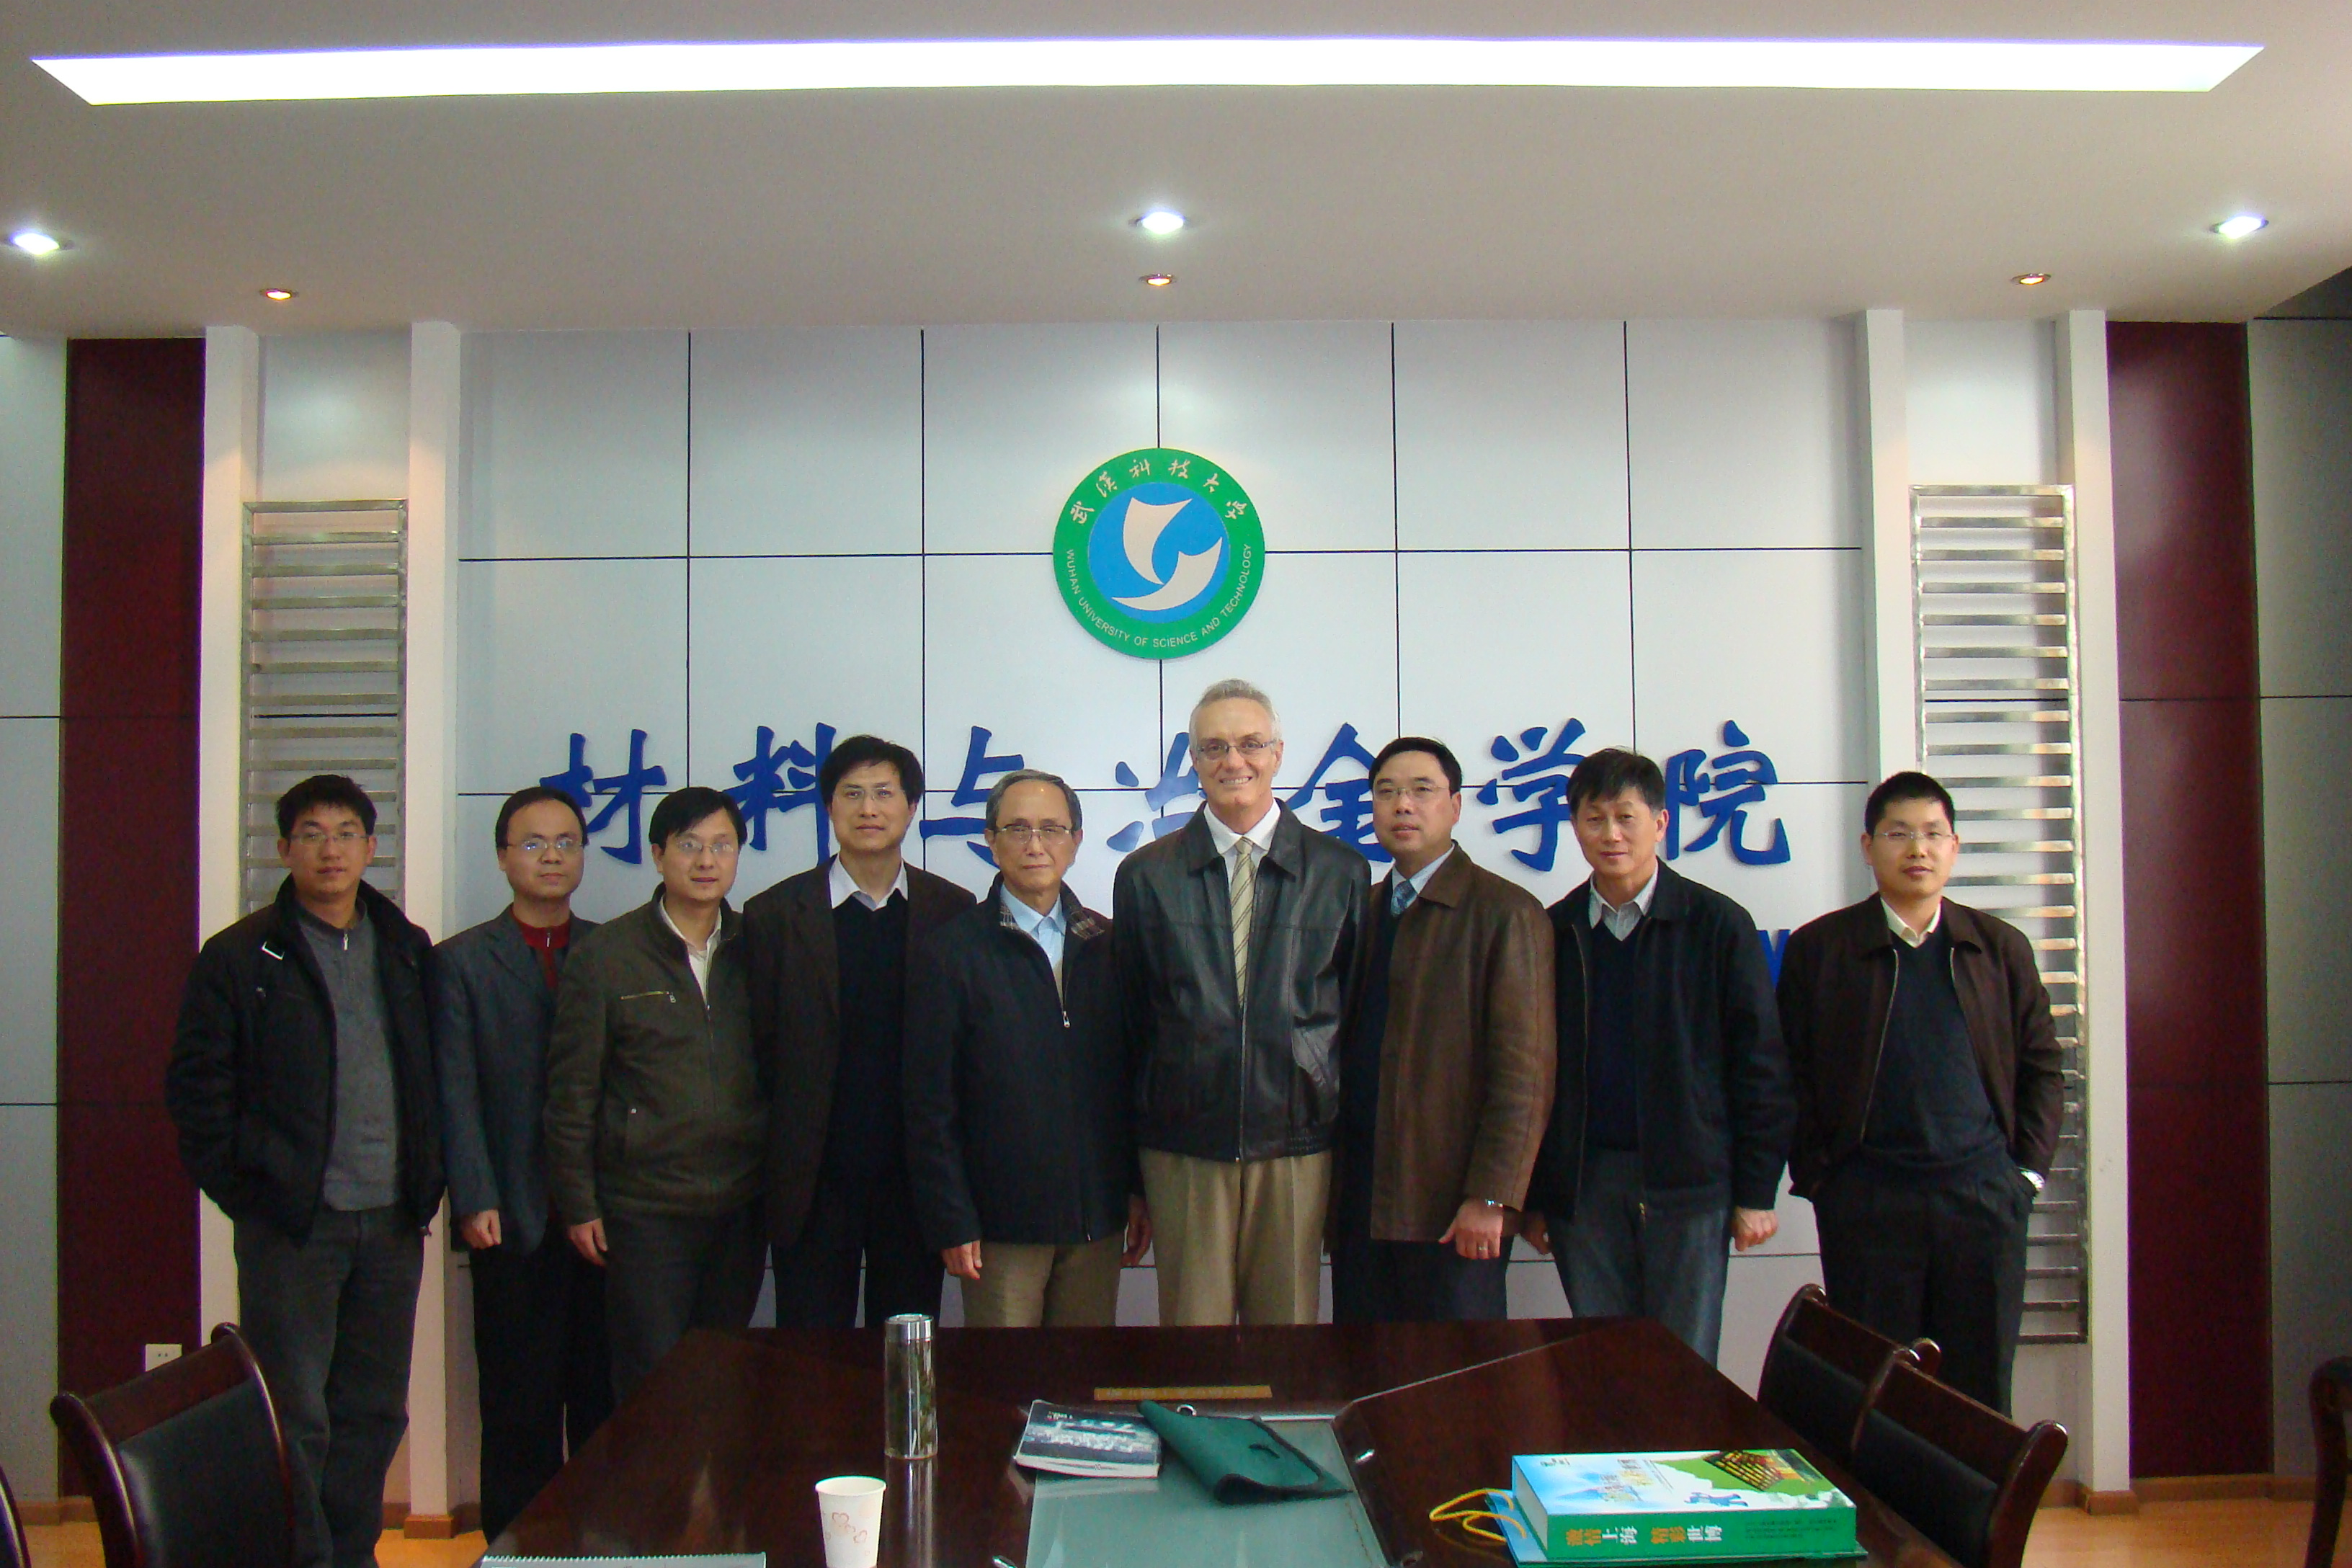 Prof. Dr. Victor C. Pandolfelli da UFSCar e Associado da ABC foi eleito Guest Professor da Wuhan University